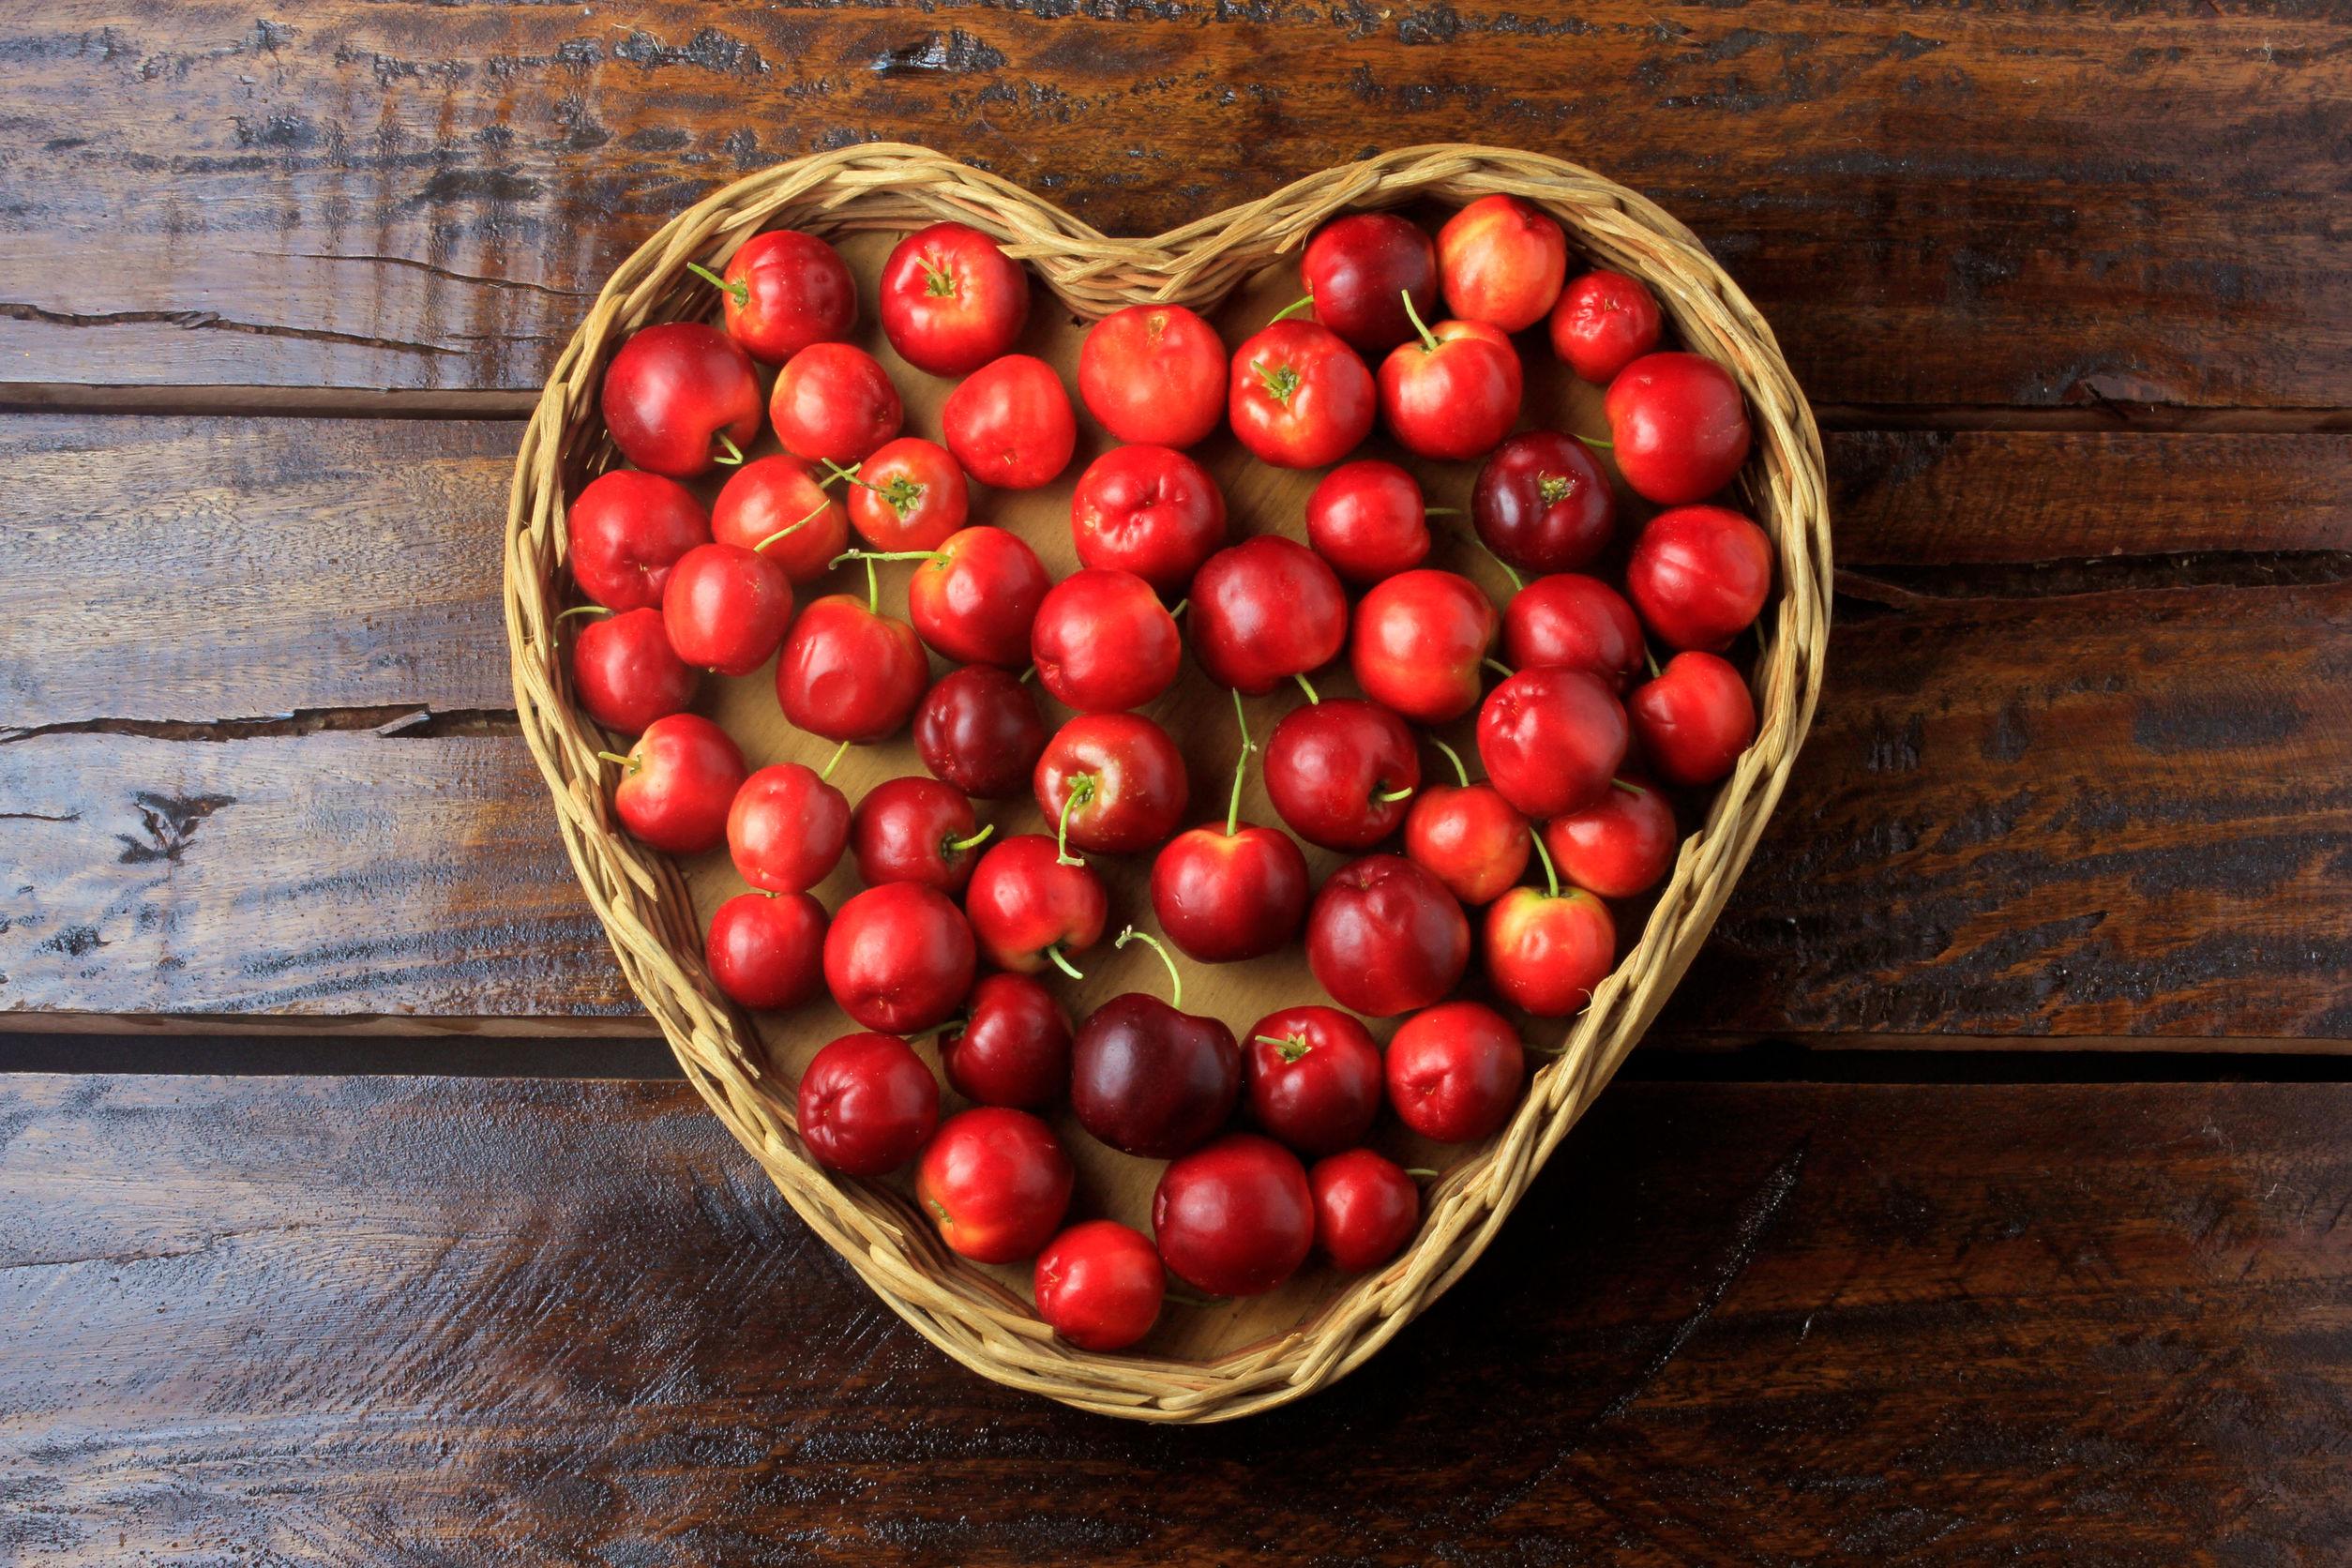 Acerola Cereza cruda, fresca, en canasta con forma de corazón sobre mesa de madera rústica, frutas antioxidantes.